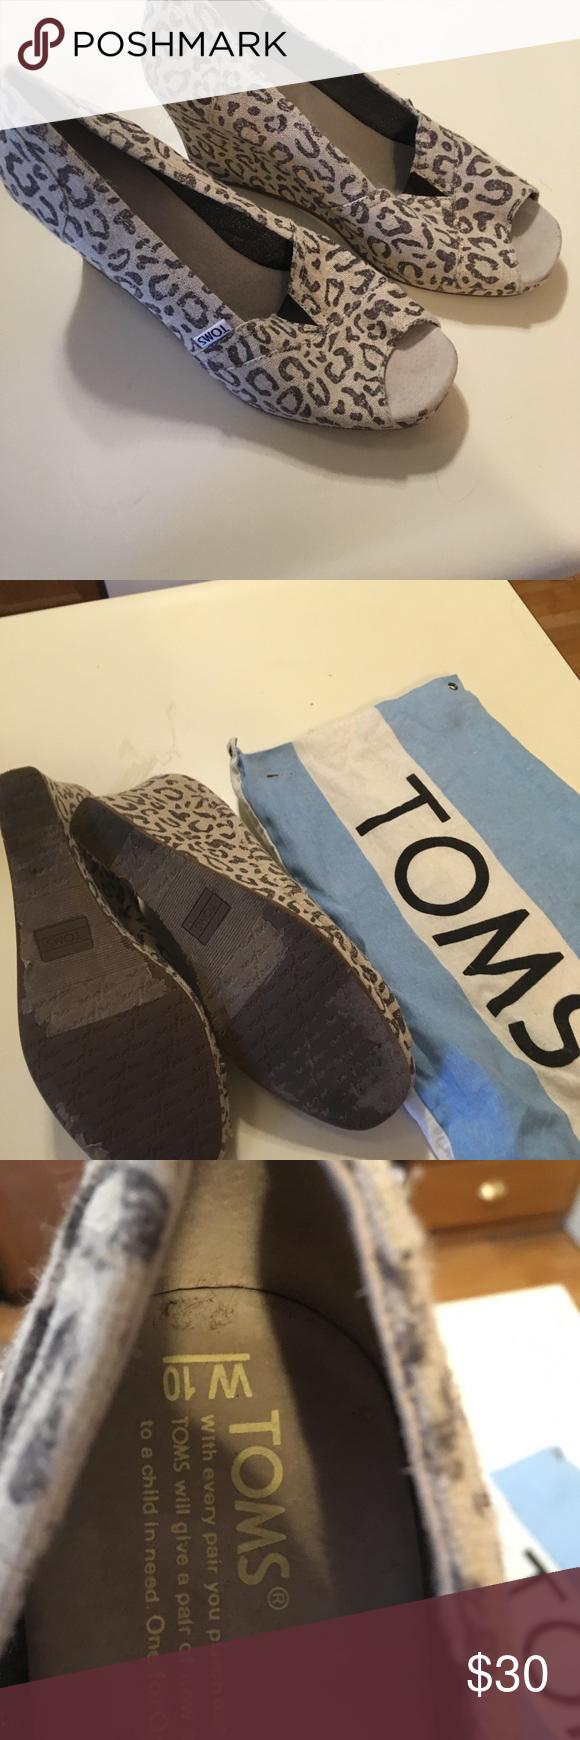 Toms wedges Toms wedges leopard print size 10w Toms Shoes Wedges #tomwedges Toms wedges Toms wedges leopard print size 10w Toms Shoes Wedges #tomwedges